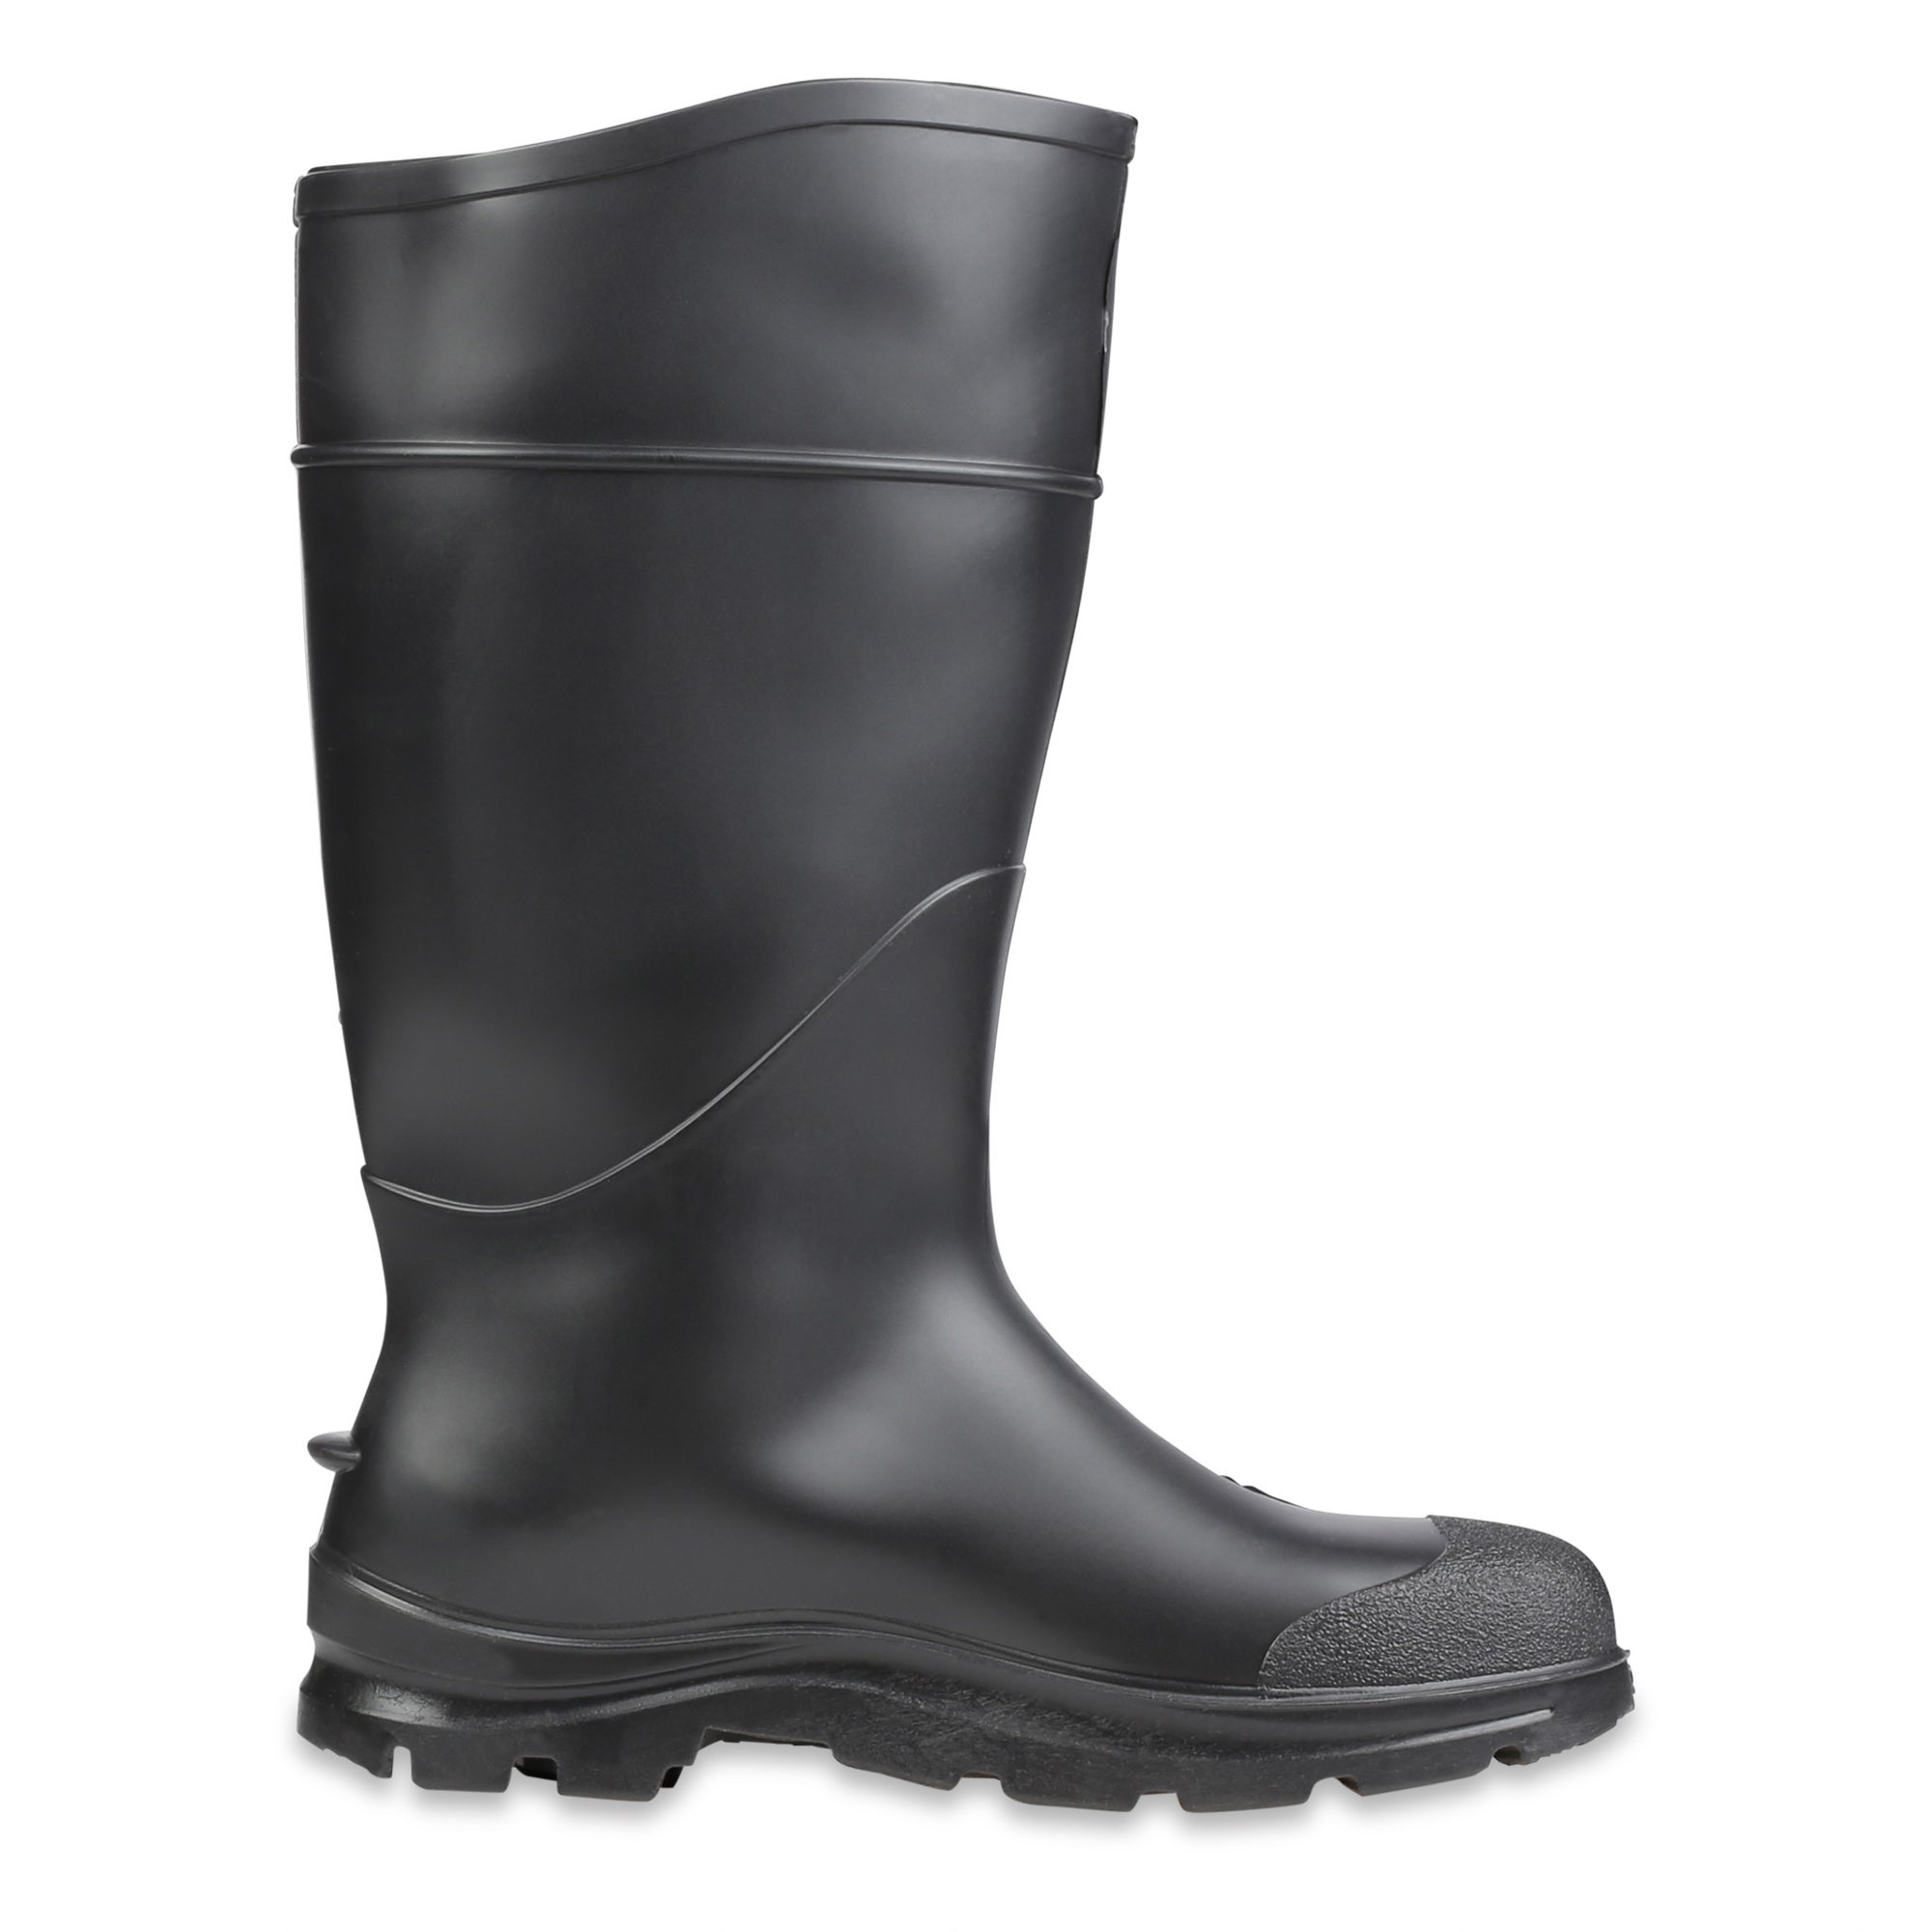 Servus Comfort Technology 14'' PVC Steel Toe Men's Work Boots, Black, Size 10 (18821) by Servus (Image #5)